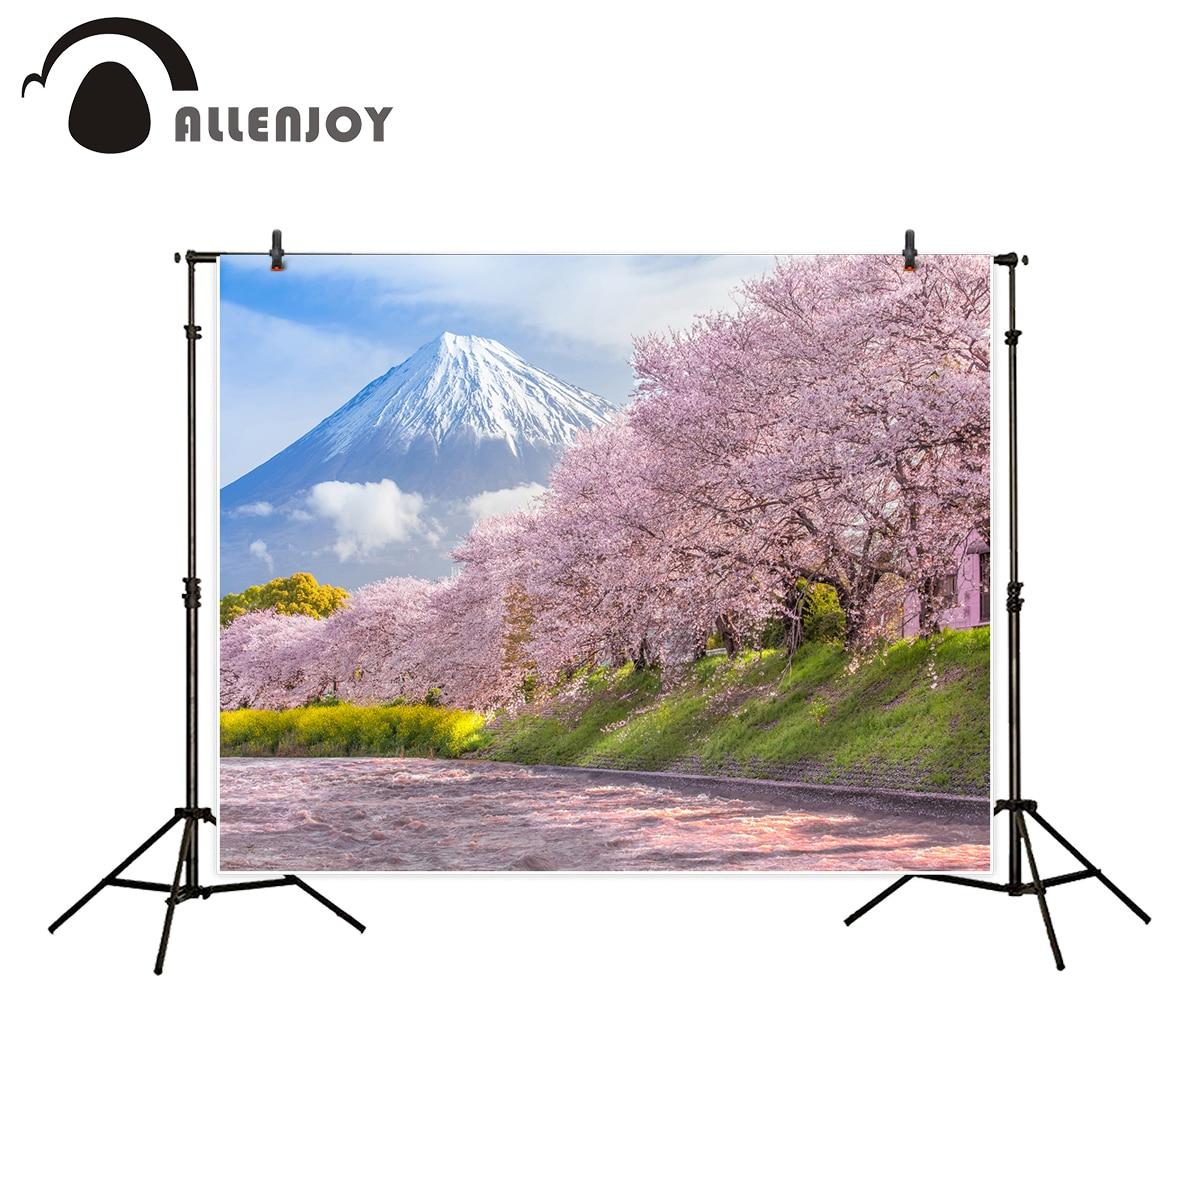 Allenjoy professional photography background beautiful mountain fuji sakura cherry blossom spring backdrop new design photocall